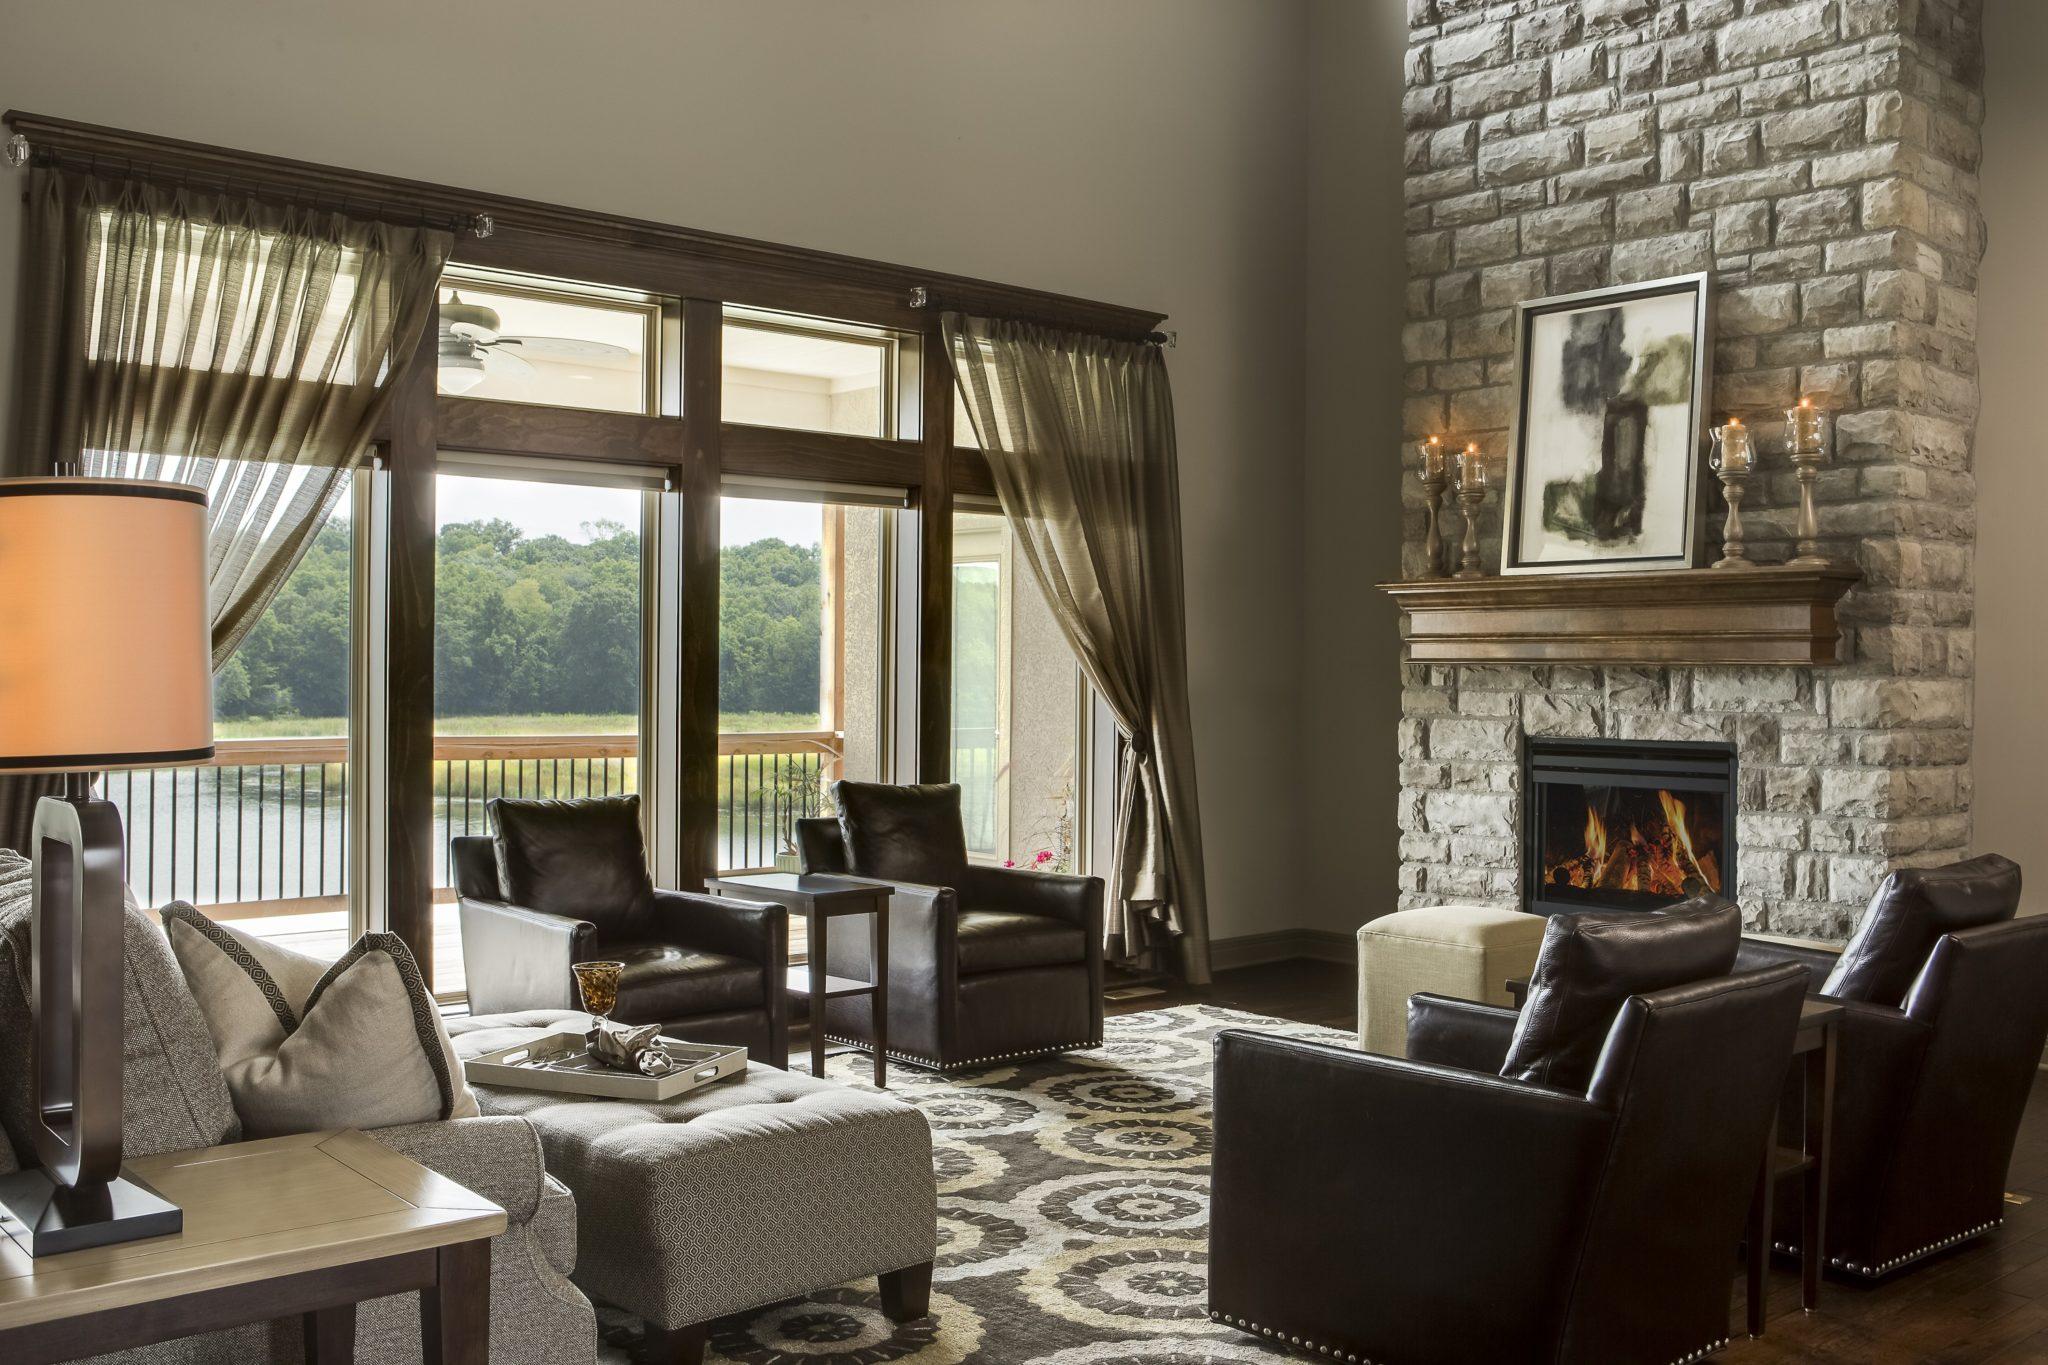 Stillwell Great Room Design Connection Inc Arlene Ladegaard Kansas City Interior Designer